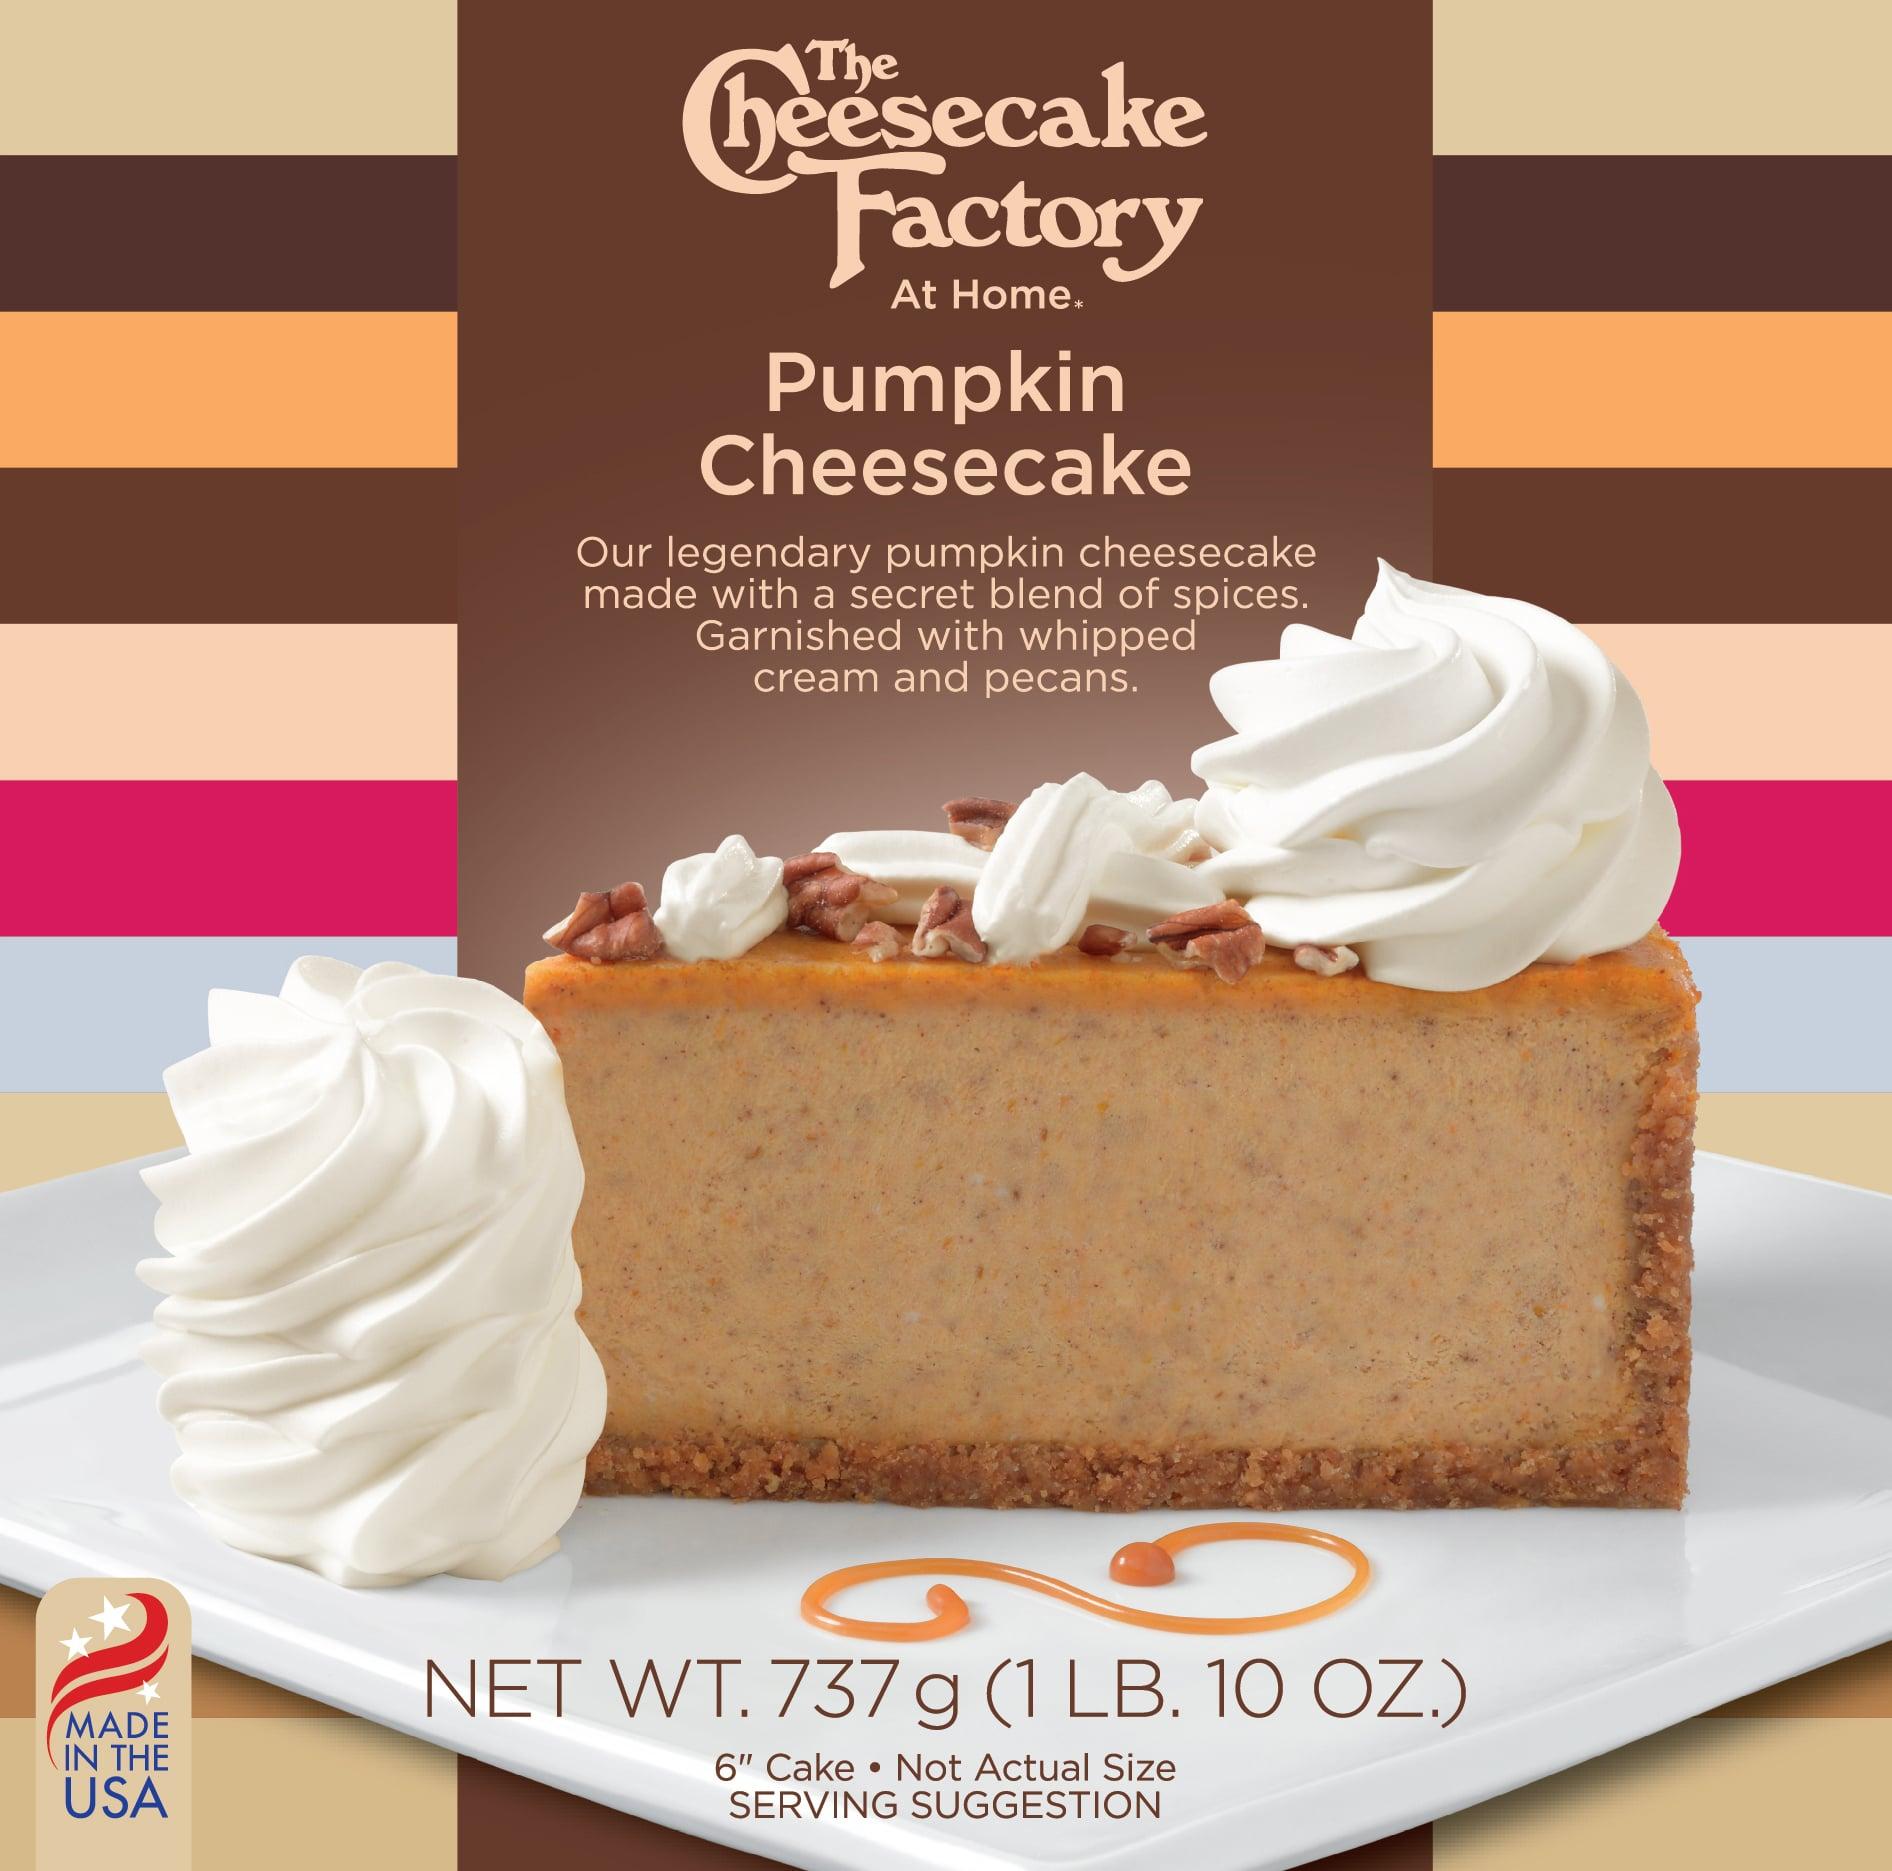 6 inch Pumpkin Cheesecake